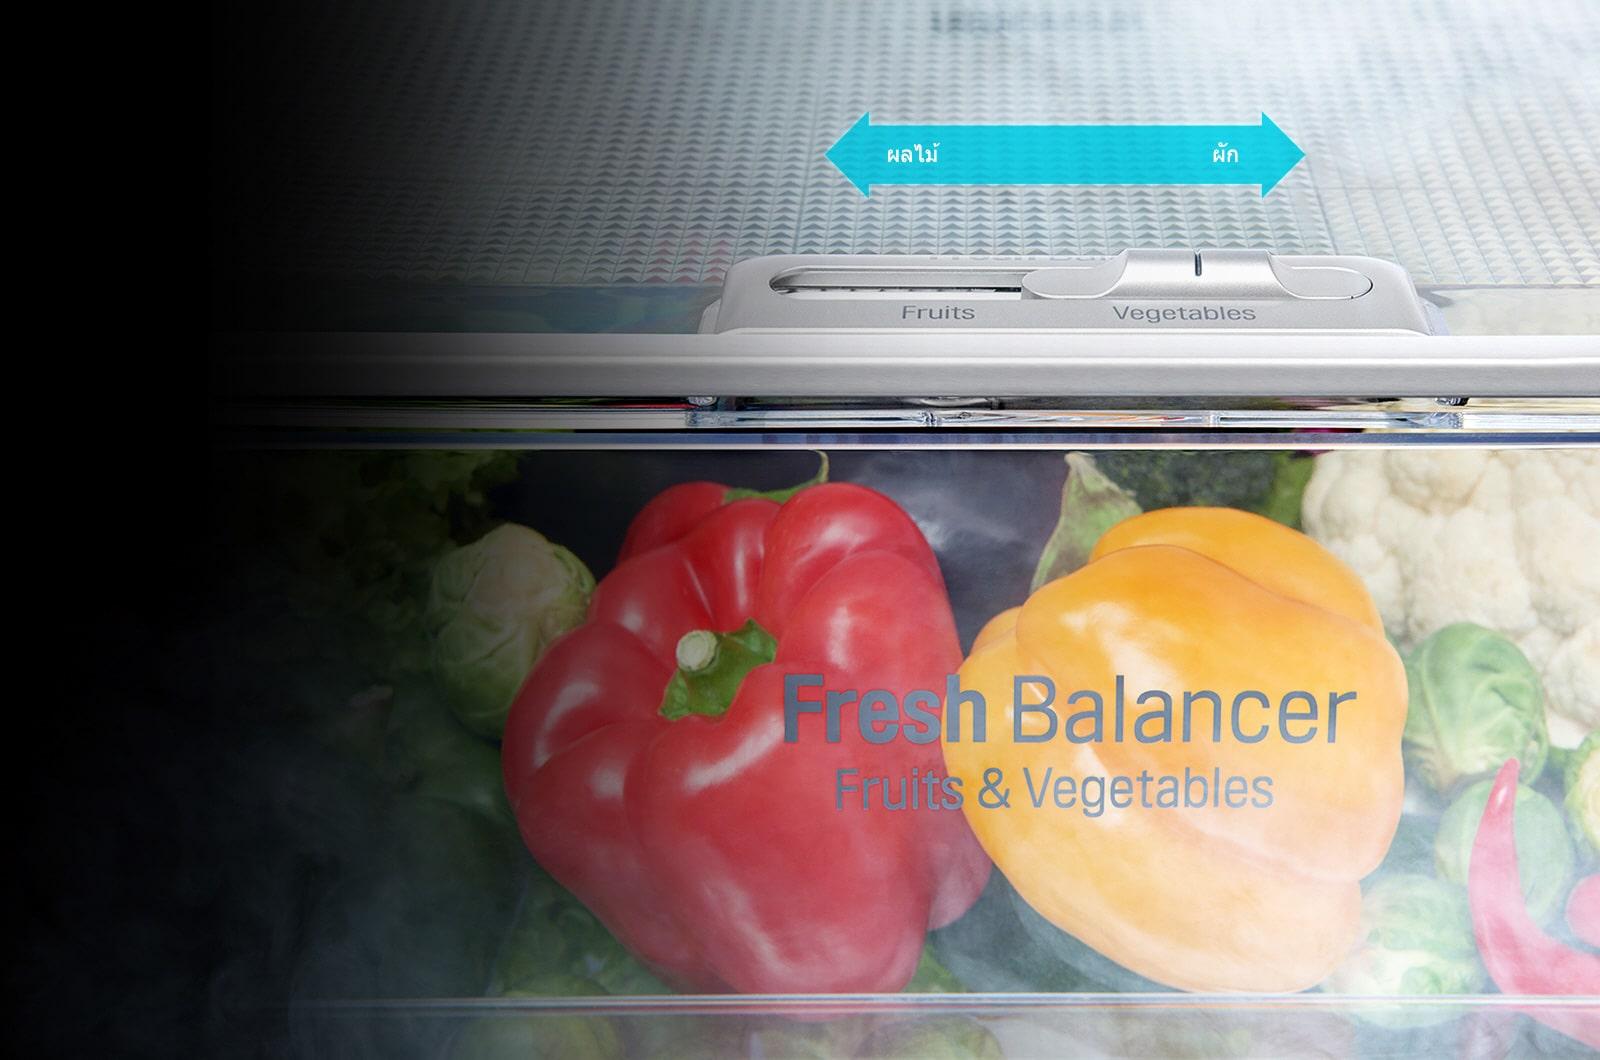 FRESHBalancer™ ฟีเจอร์ตู้เย็น LG